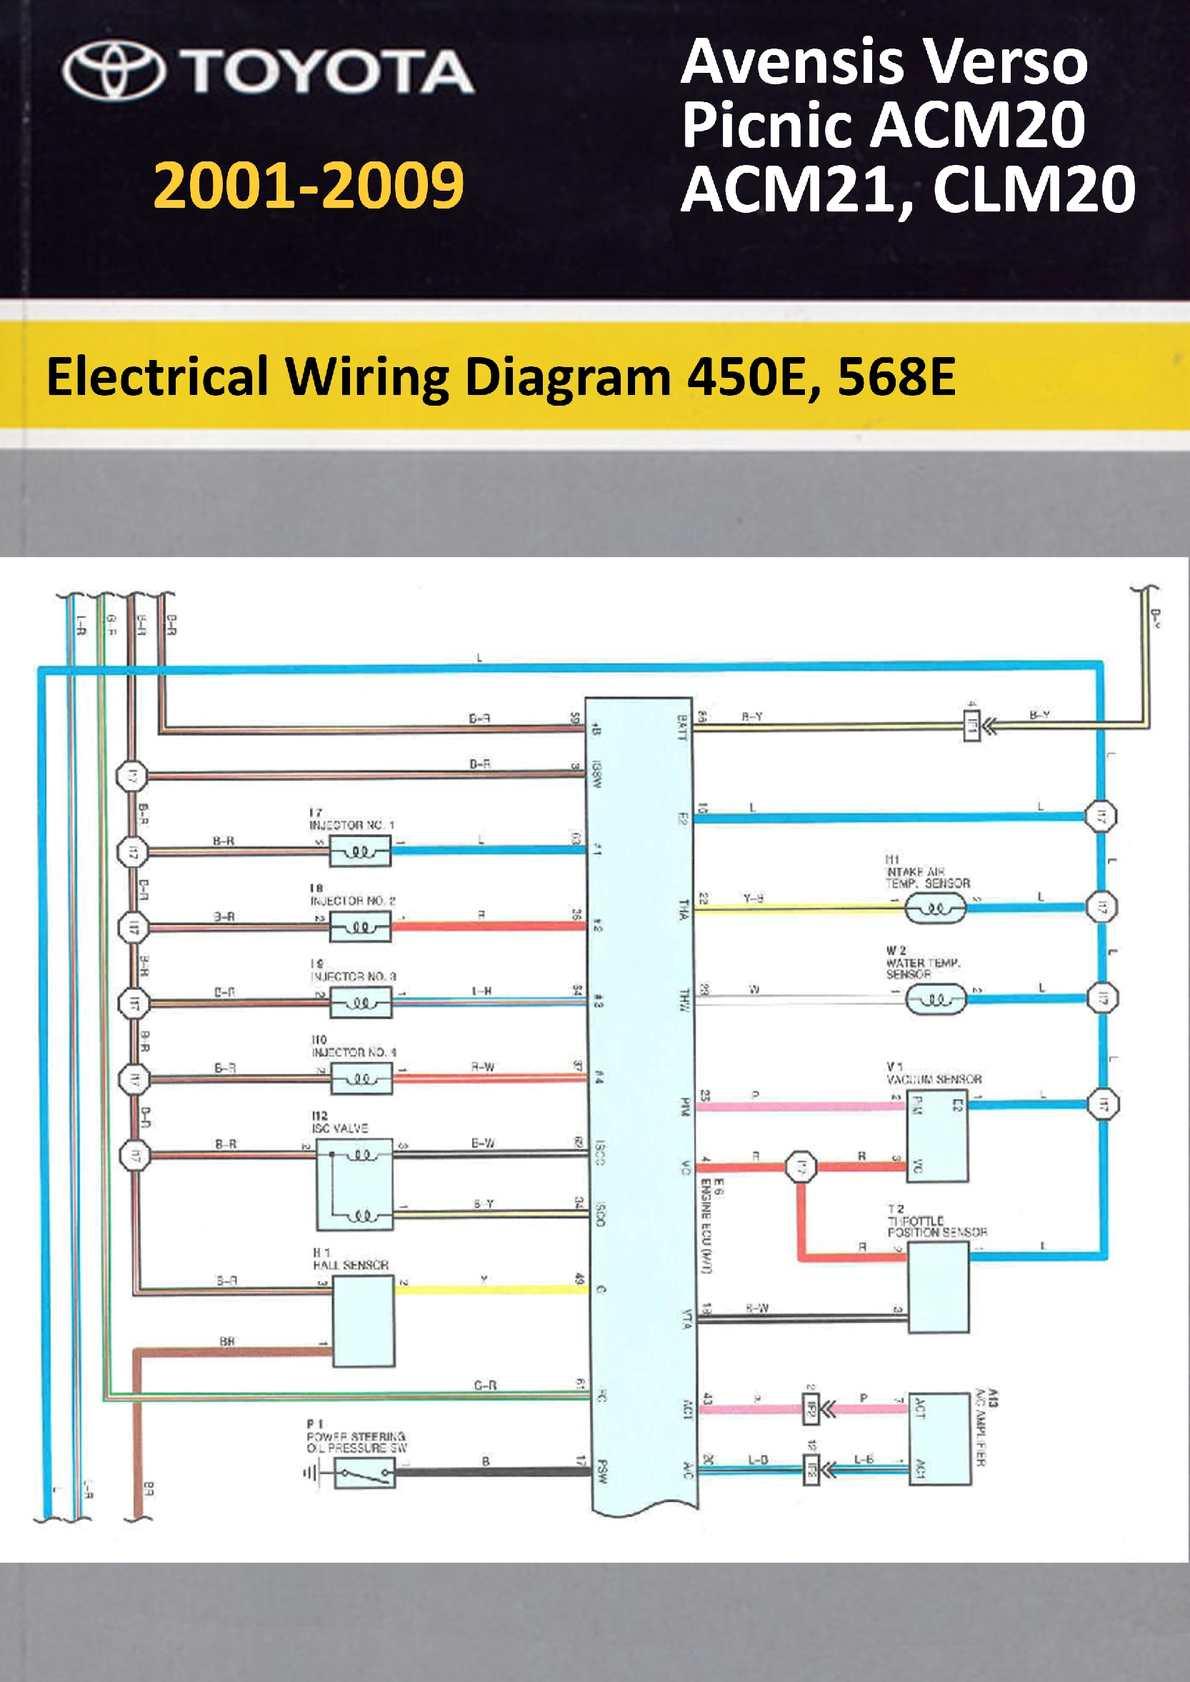 toyota avensis wiring diagram calaméo - vnx.su-avensis-verso-picnic-ewd-568e-450e_Часть1 1996 toyota 4runner wiring diagram